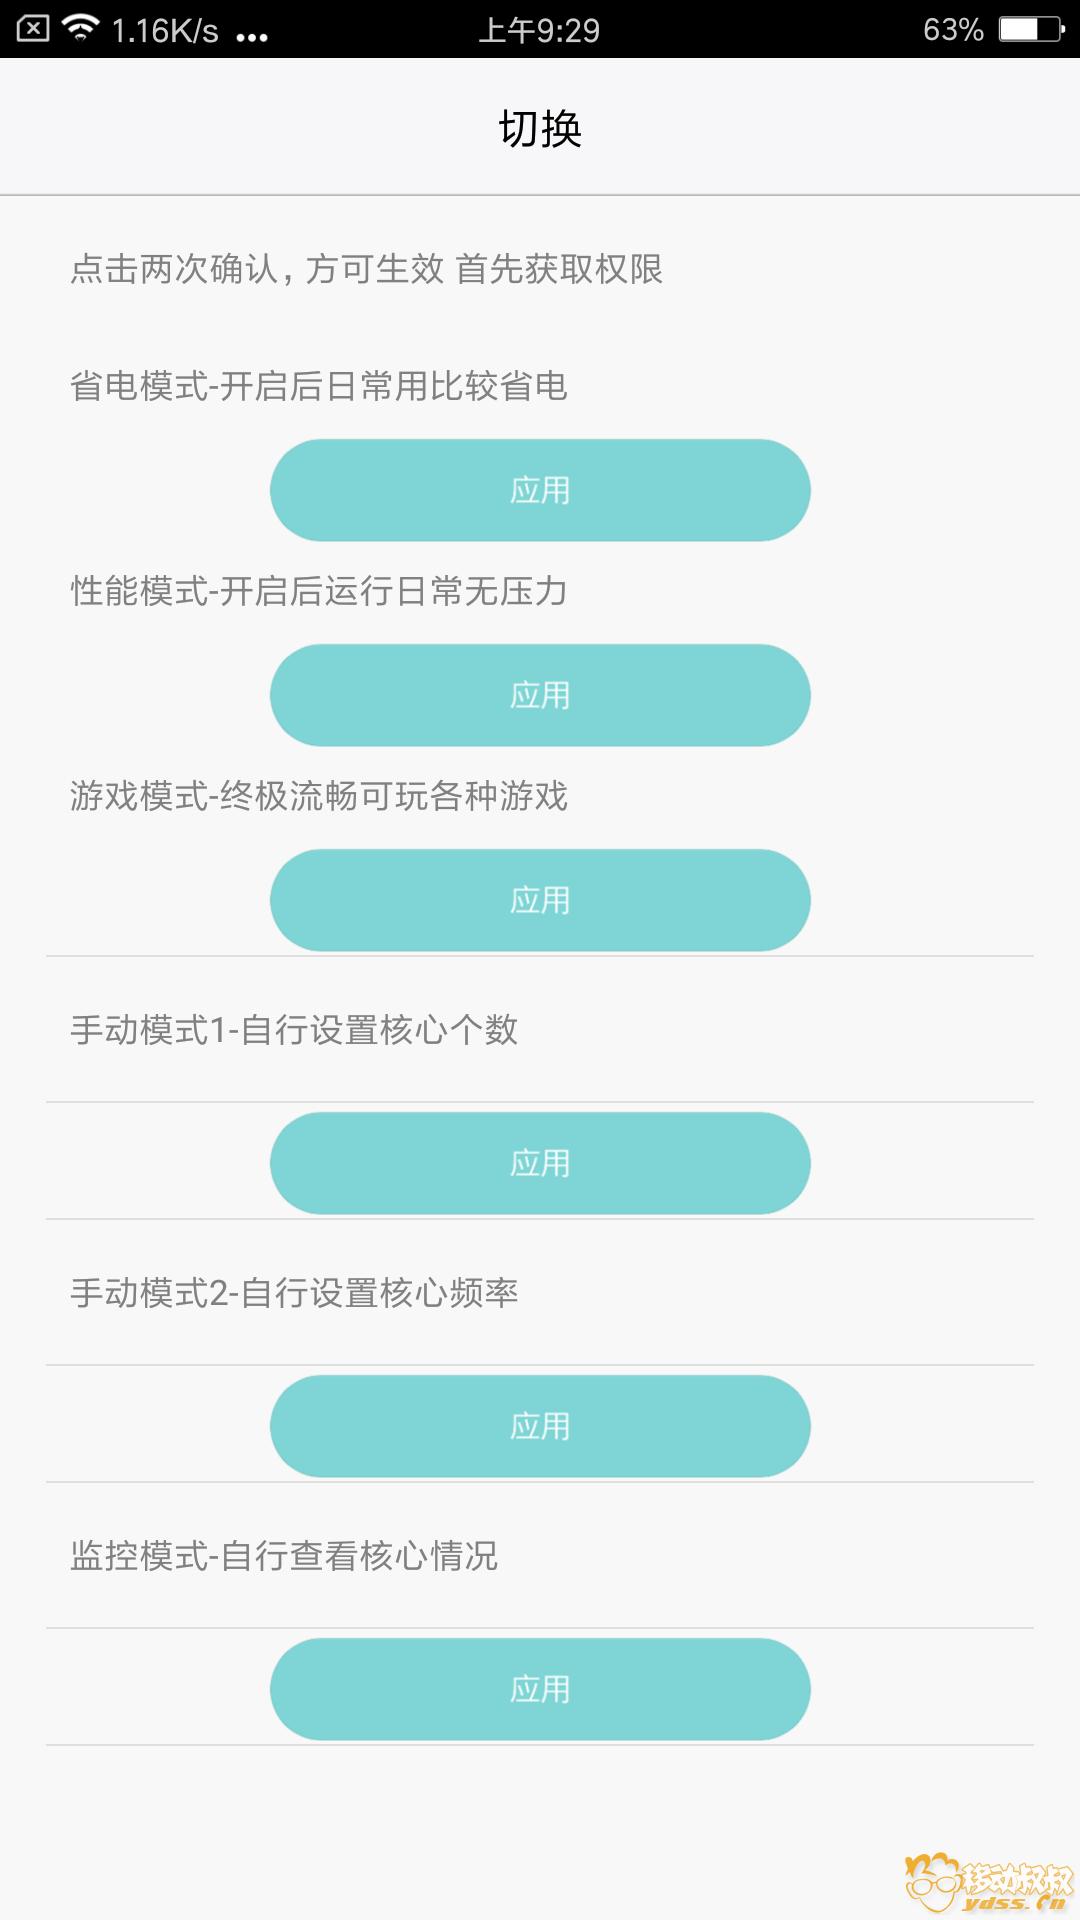 Screenshot_2018-03-13-09-29-06-788_com.nkll.settings.png